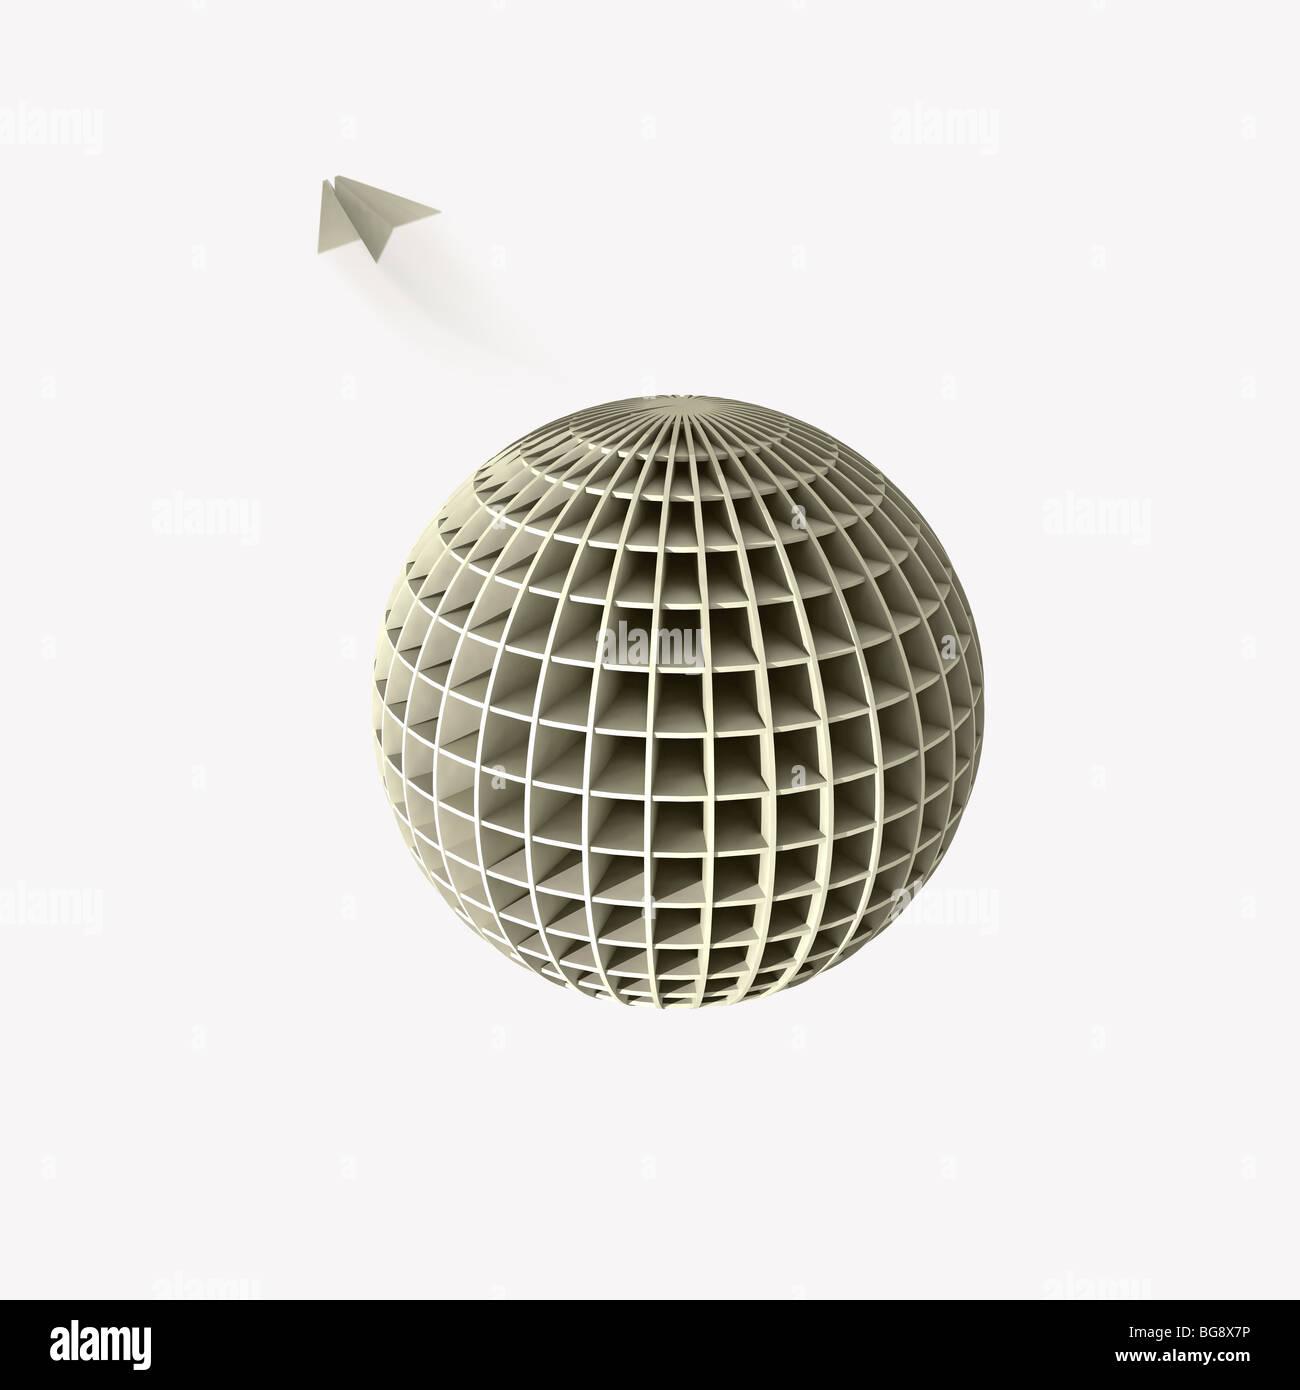 global innovations - Stock Image